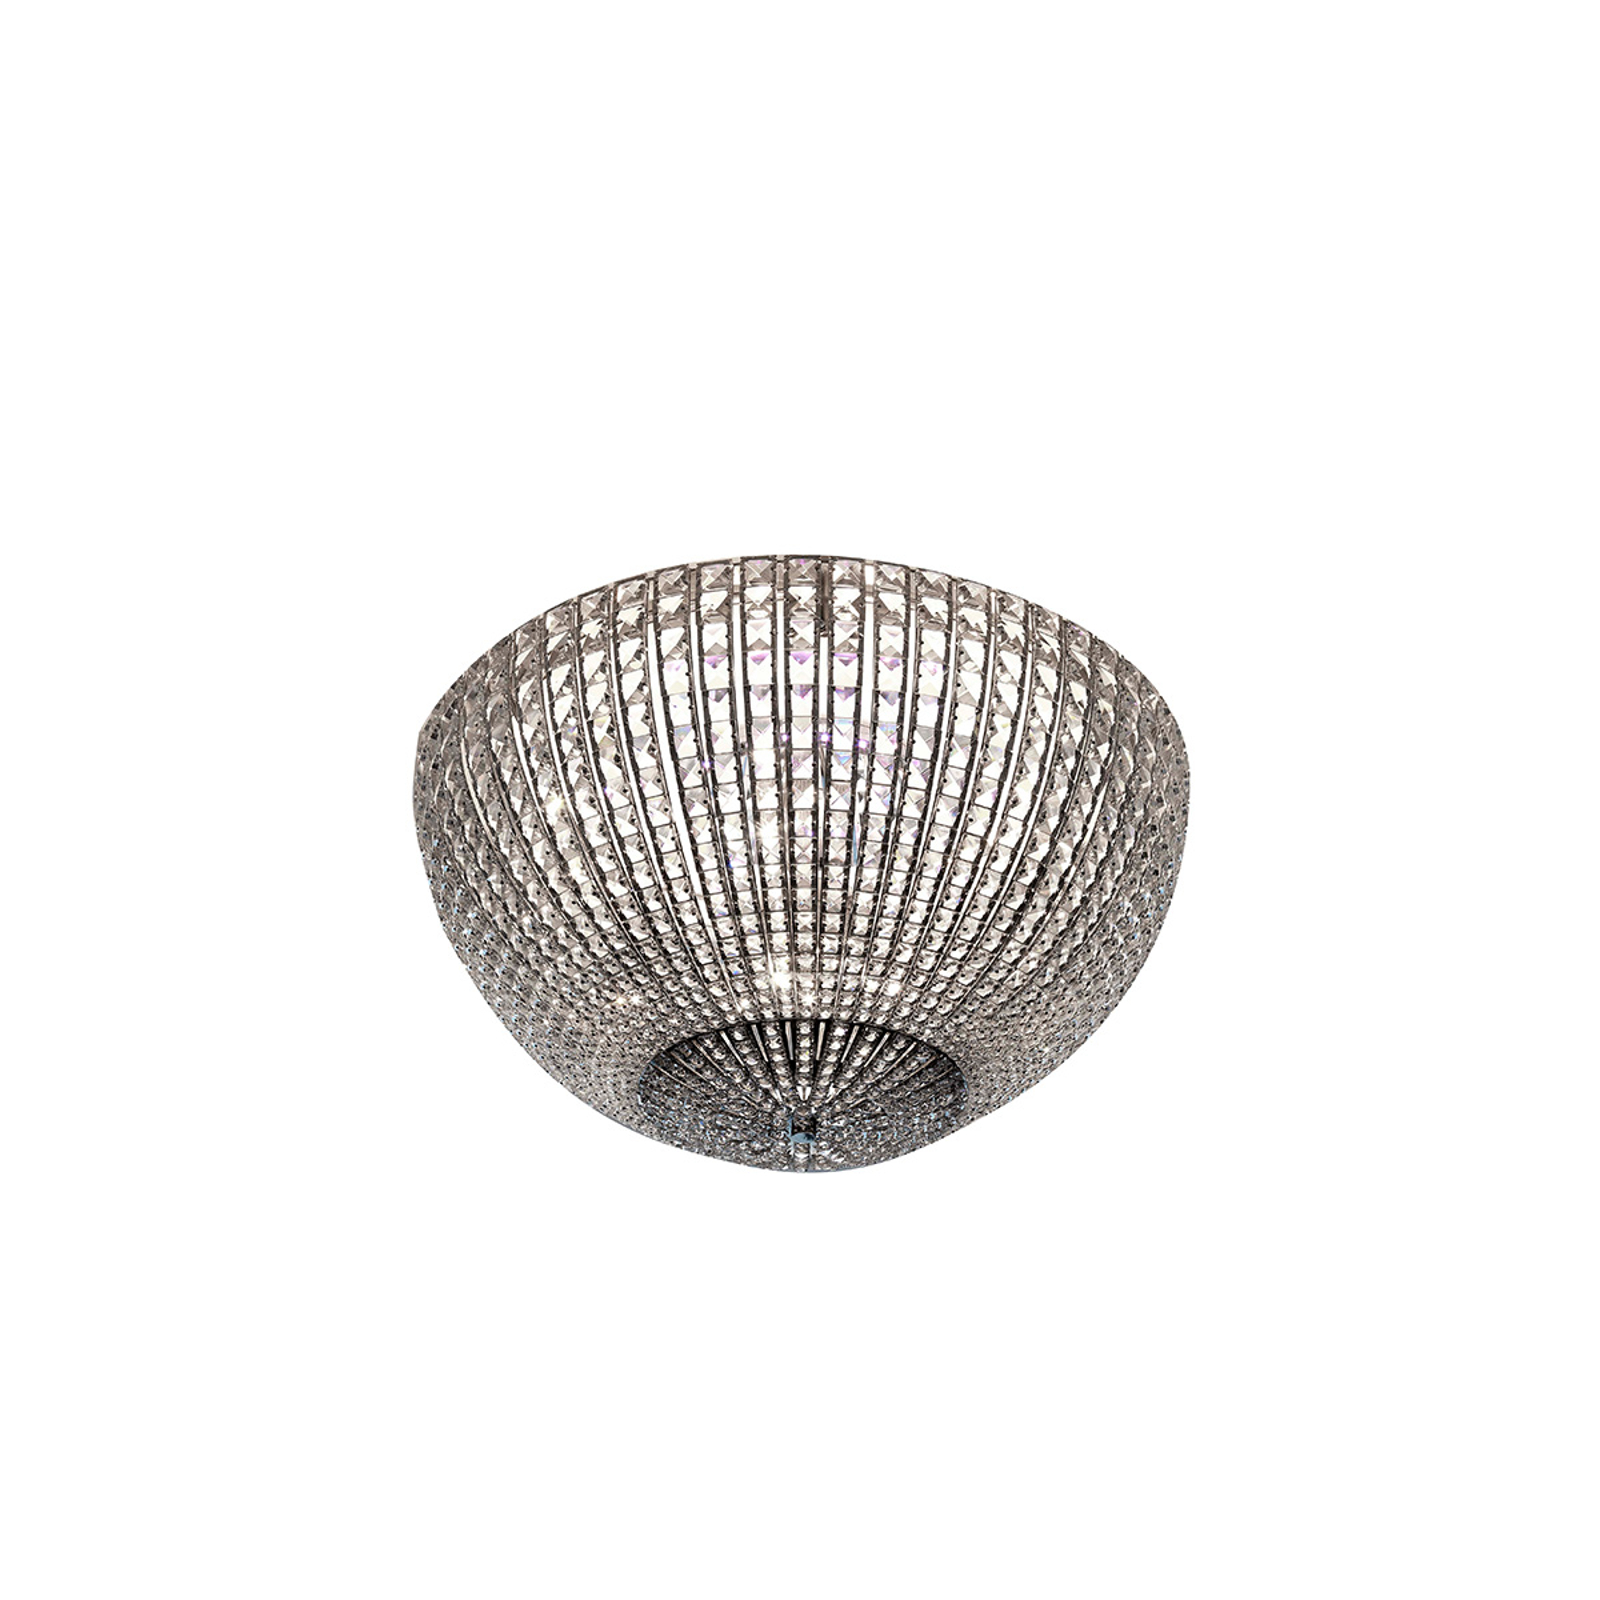 Reprezentacyjna lampa sufitowa Helidos 37 cm